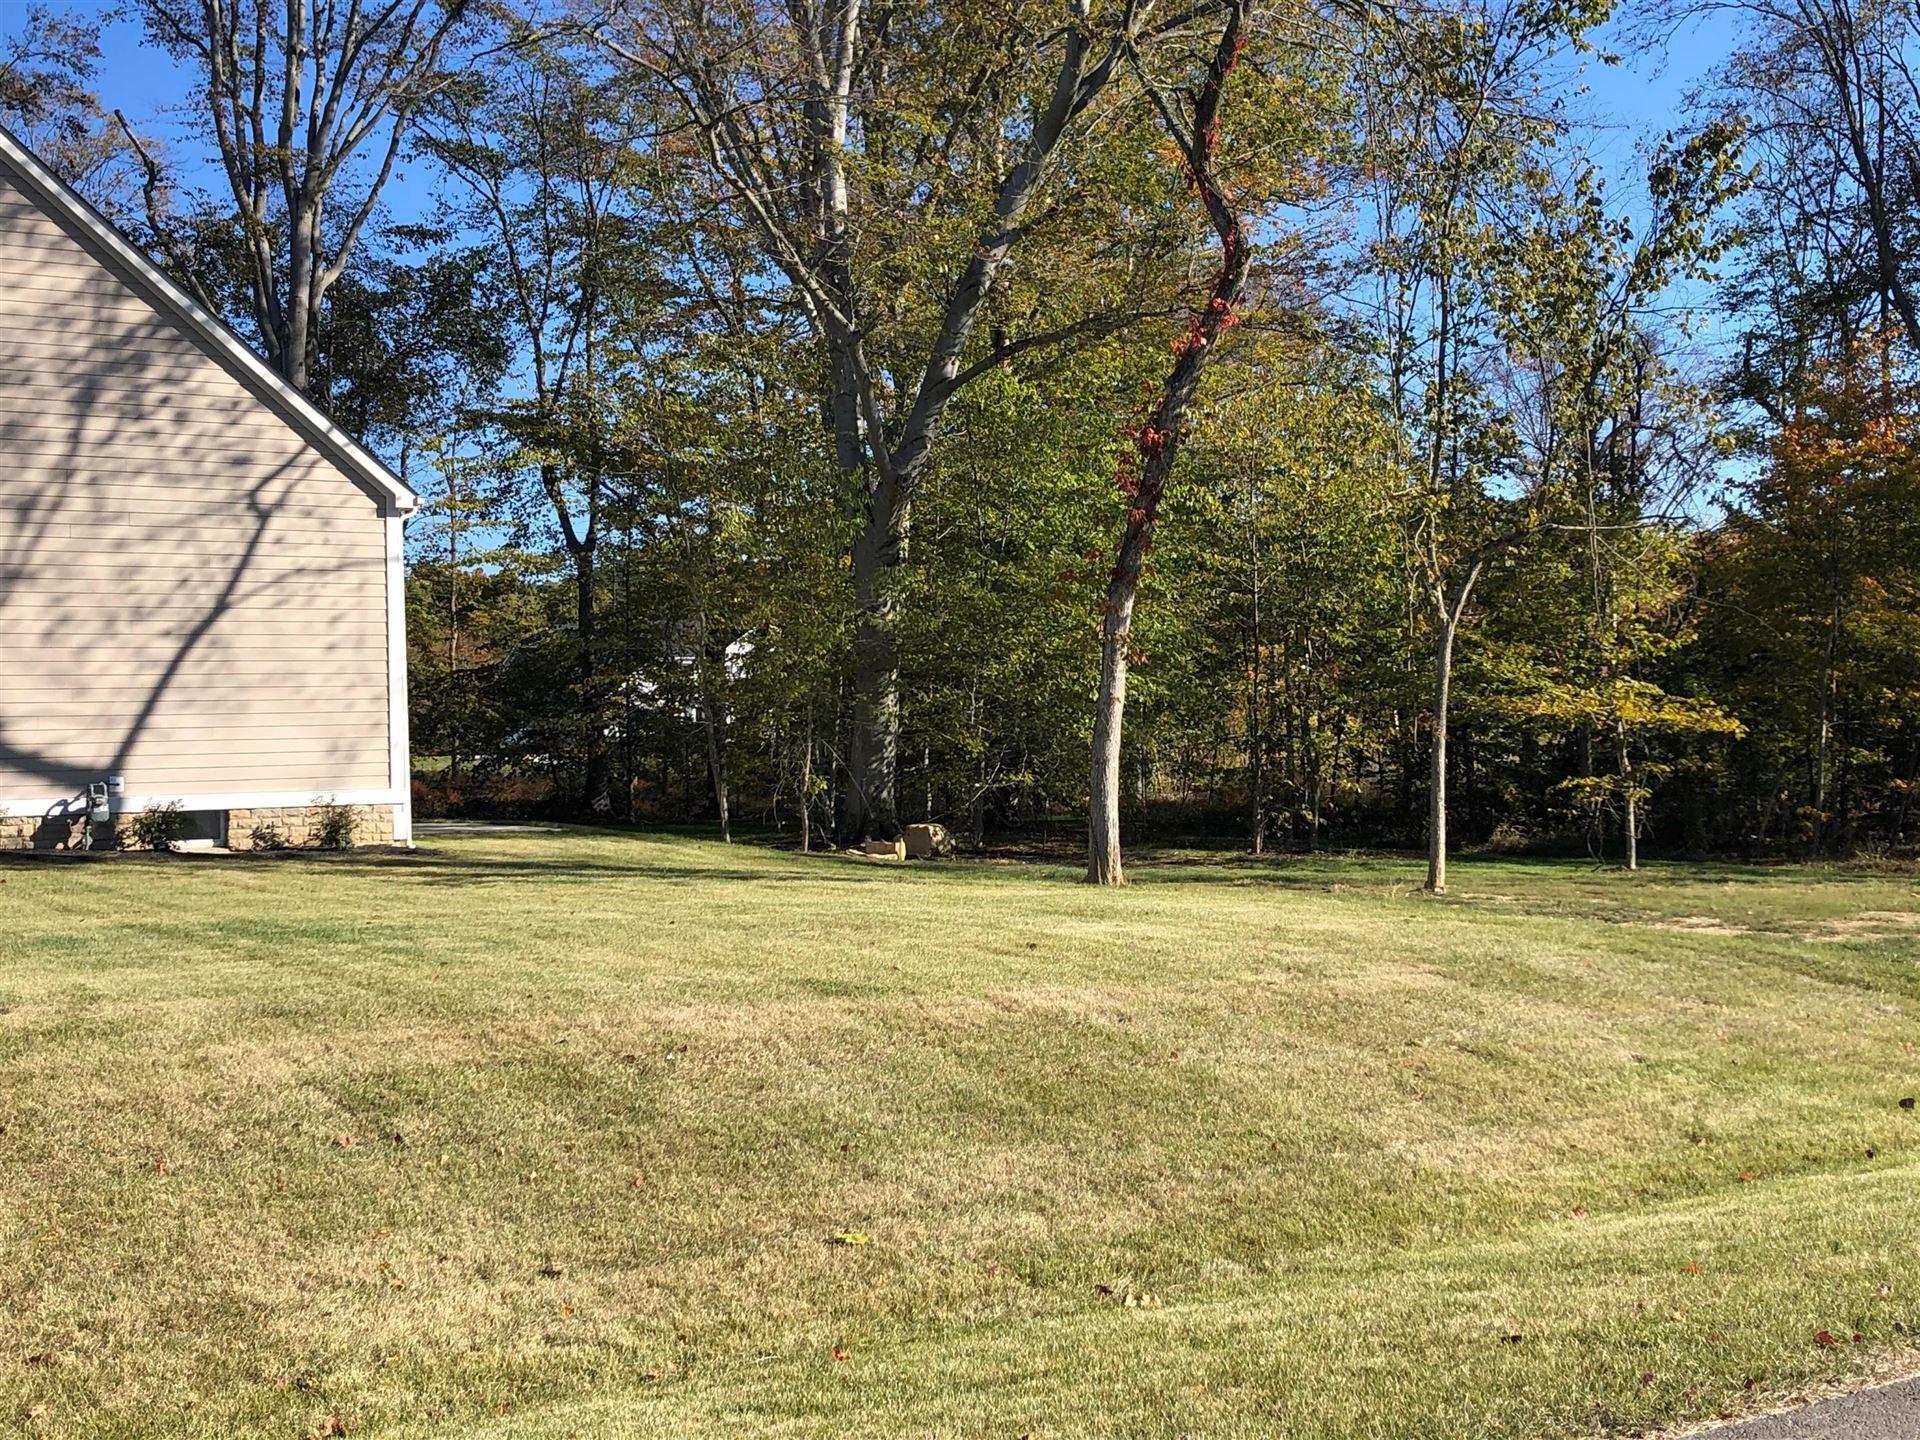 Photo of 2380 Forestview Lane, Delaware, OH 43015 (MLS # 220005848)